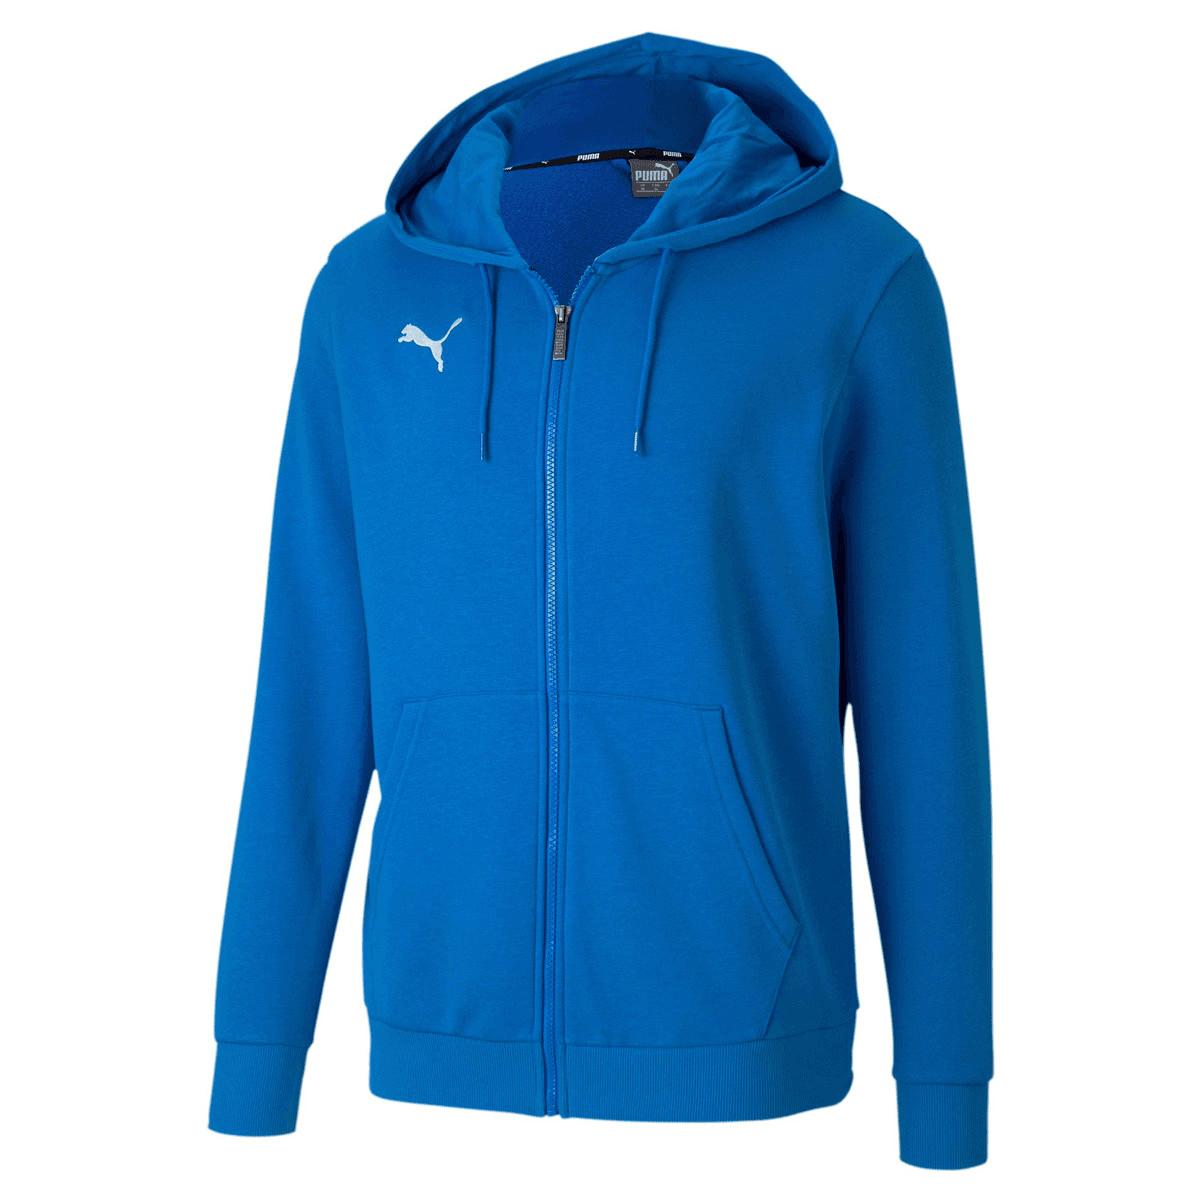 Puma Kapuzenjacke Team Goal 23 Casuals Hooded Jacket blau